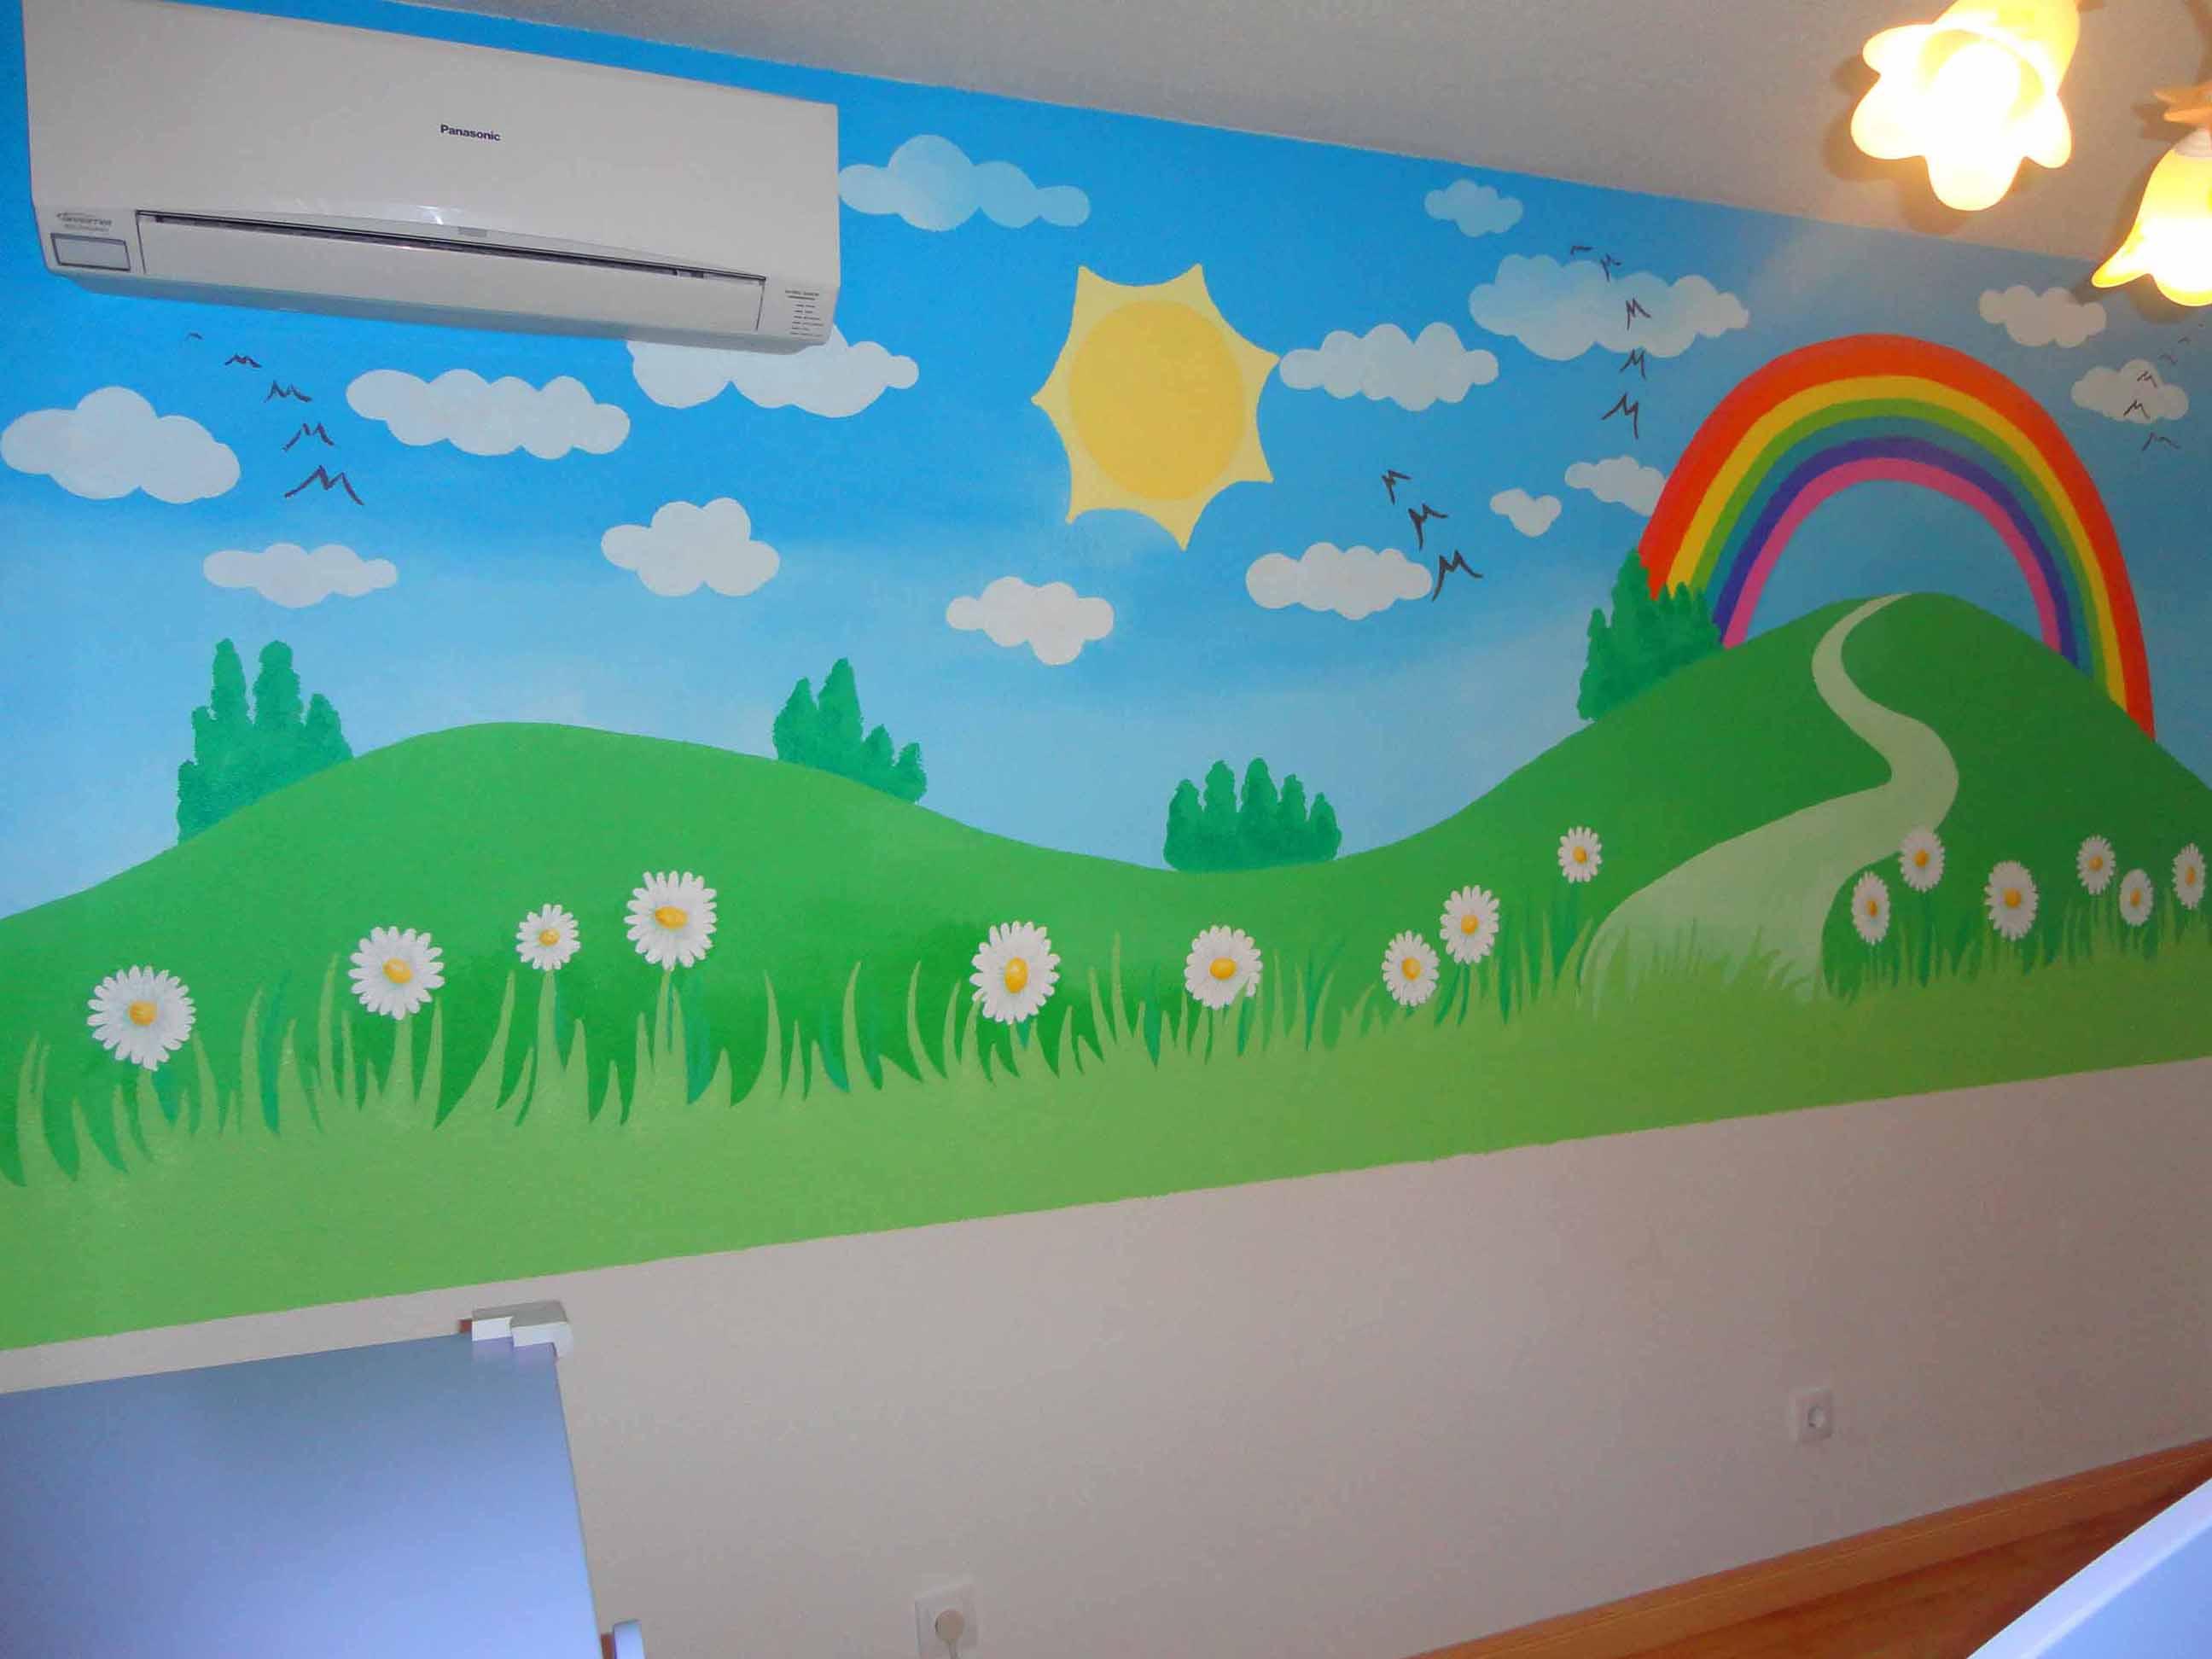 Mural Pared Infantil Best Pintar Murales Infantiles V With Mural